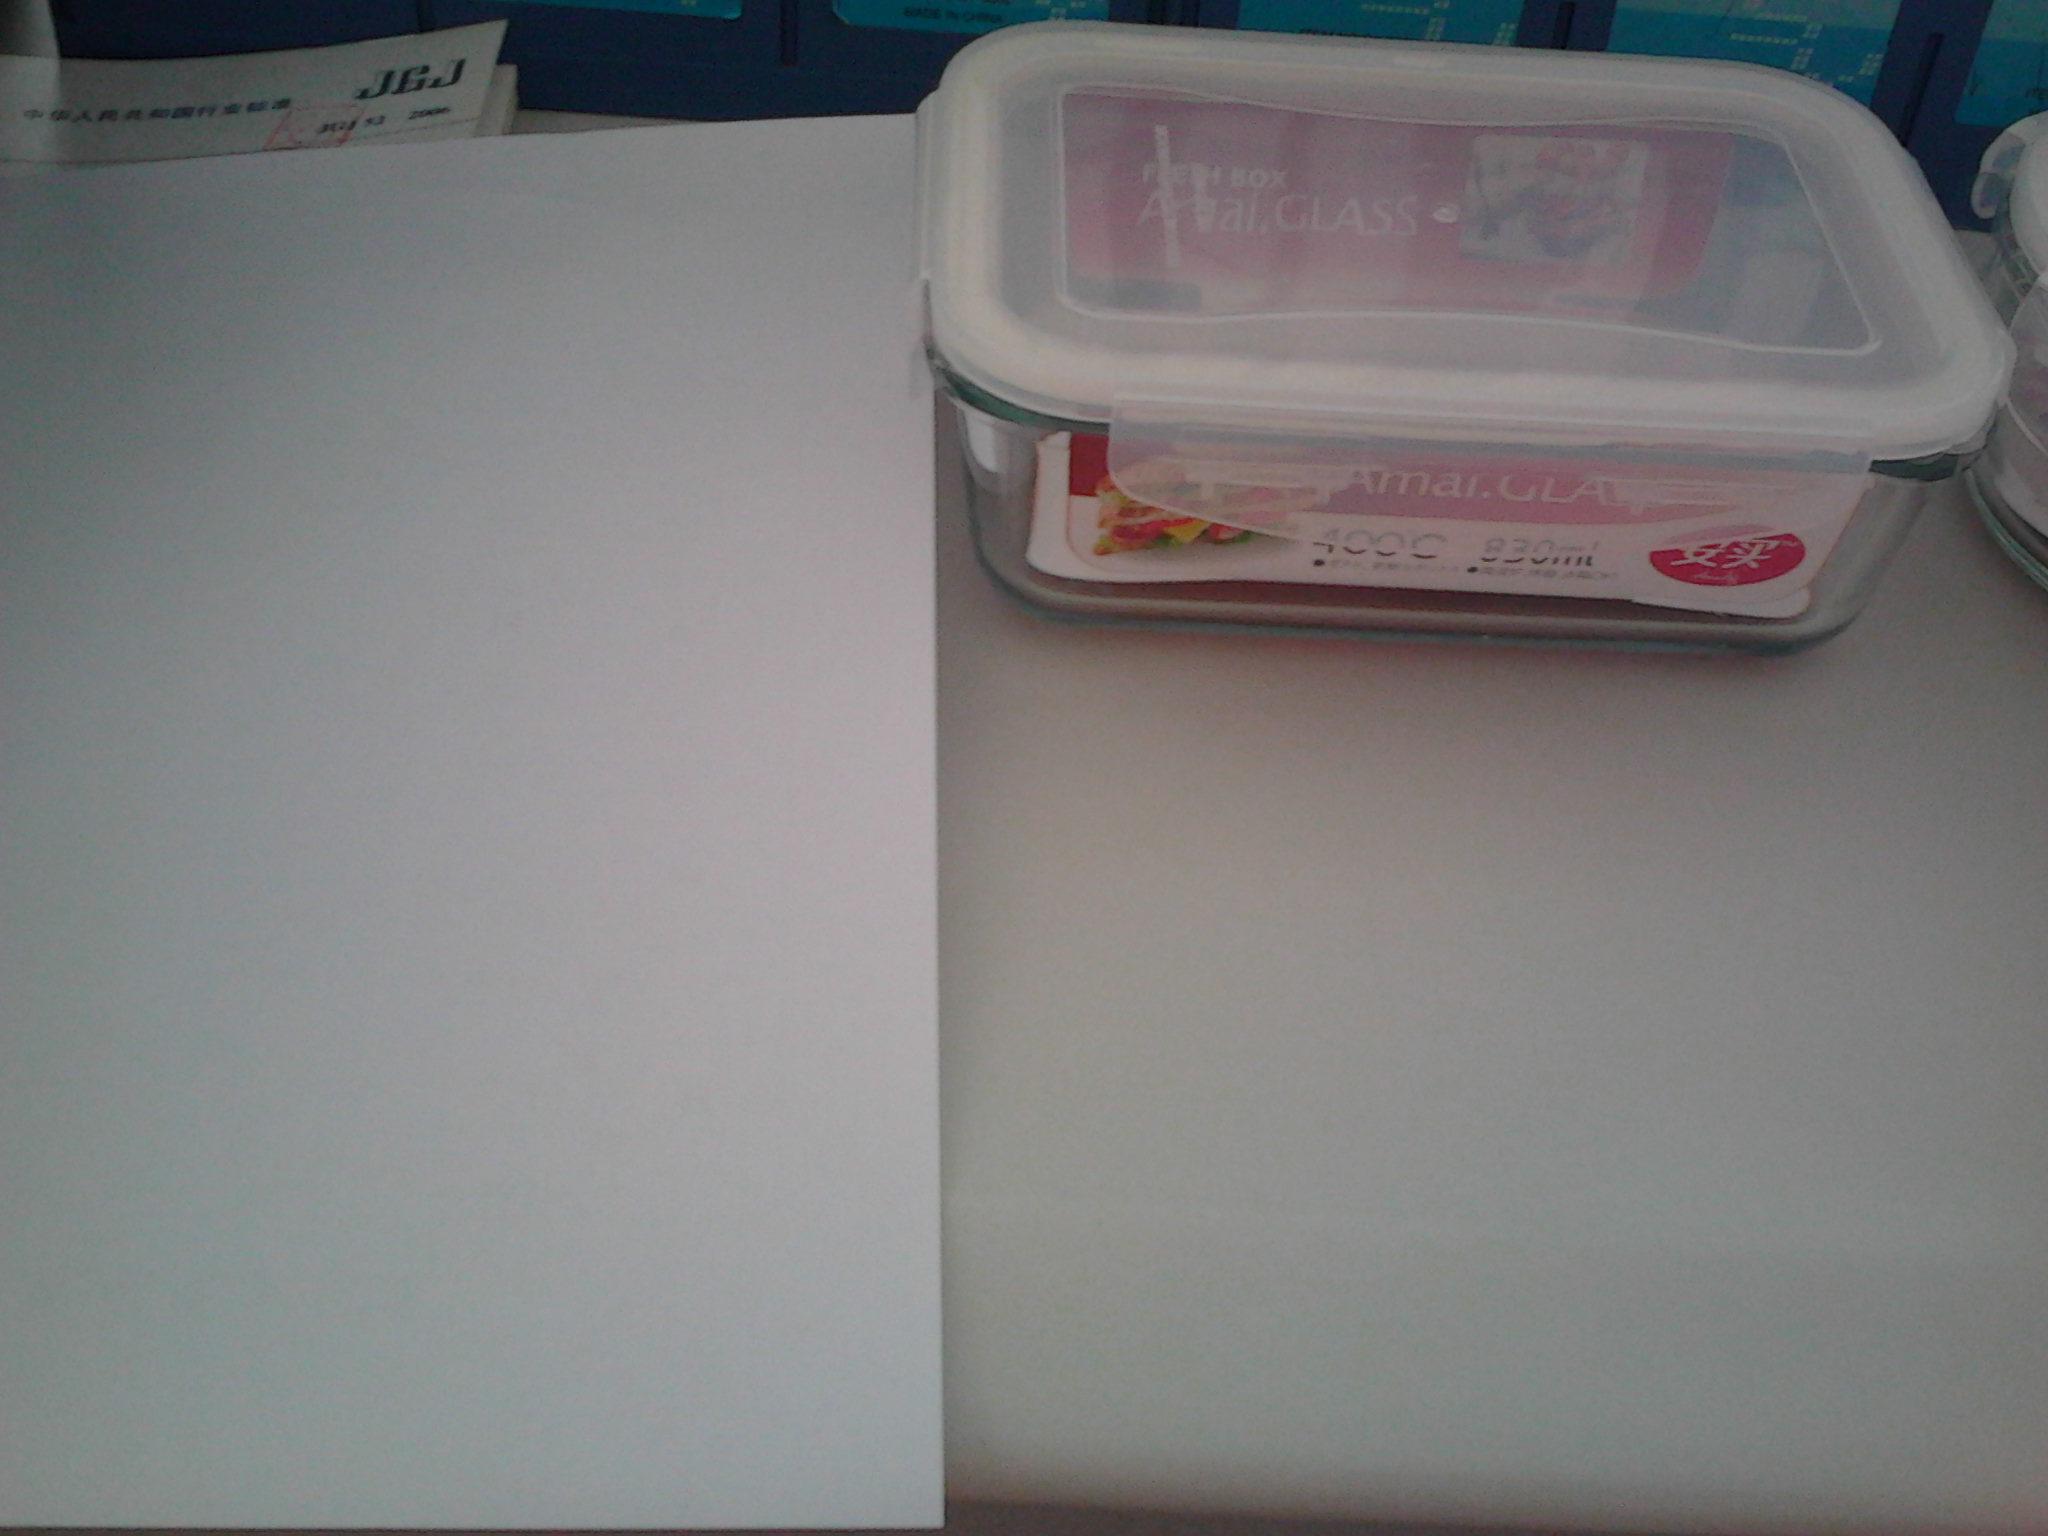 coach handbag outlet store online 00259764 discountonlinestore